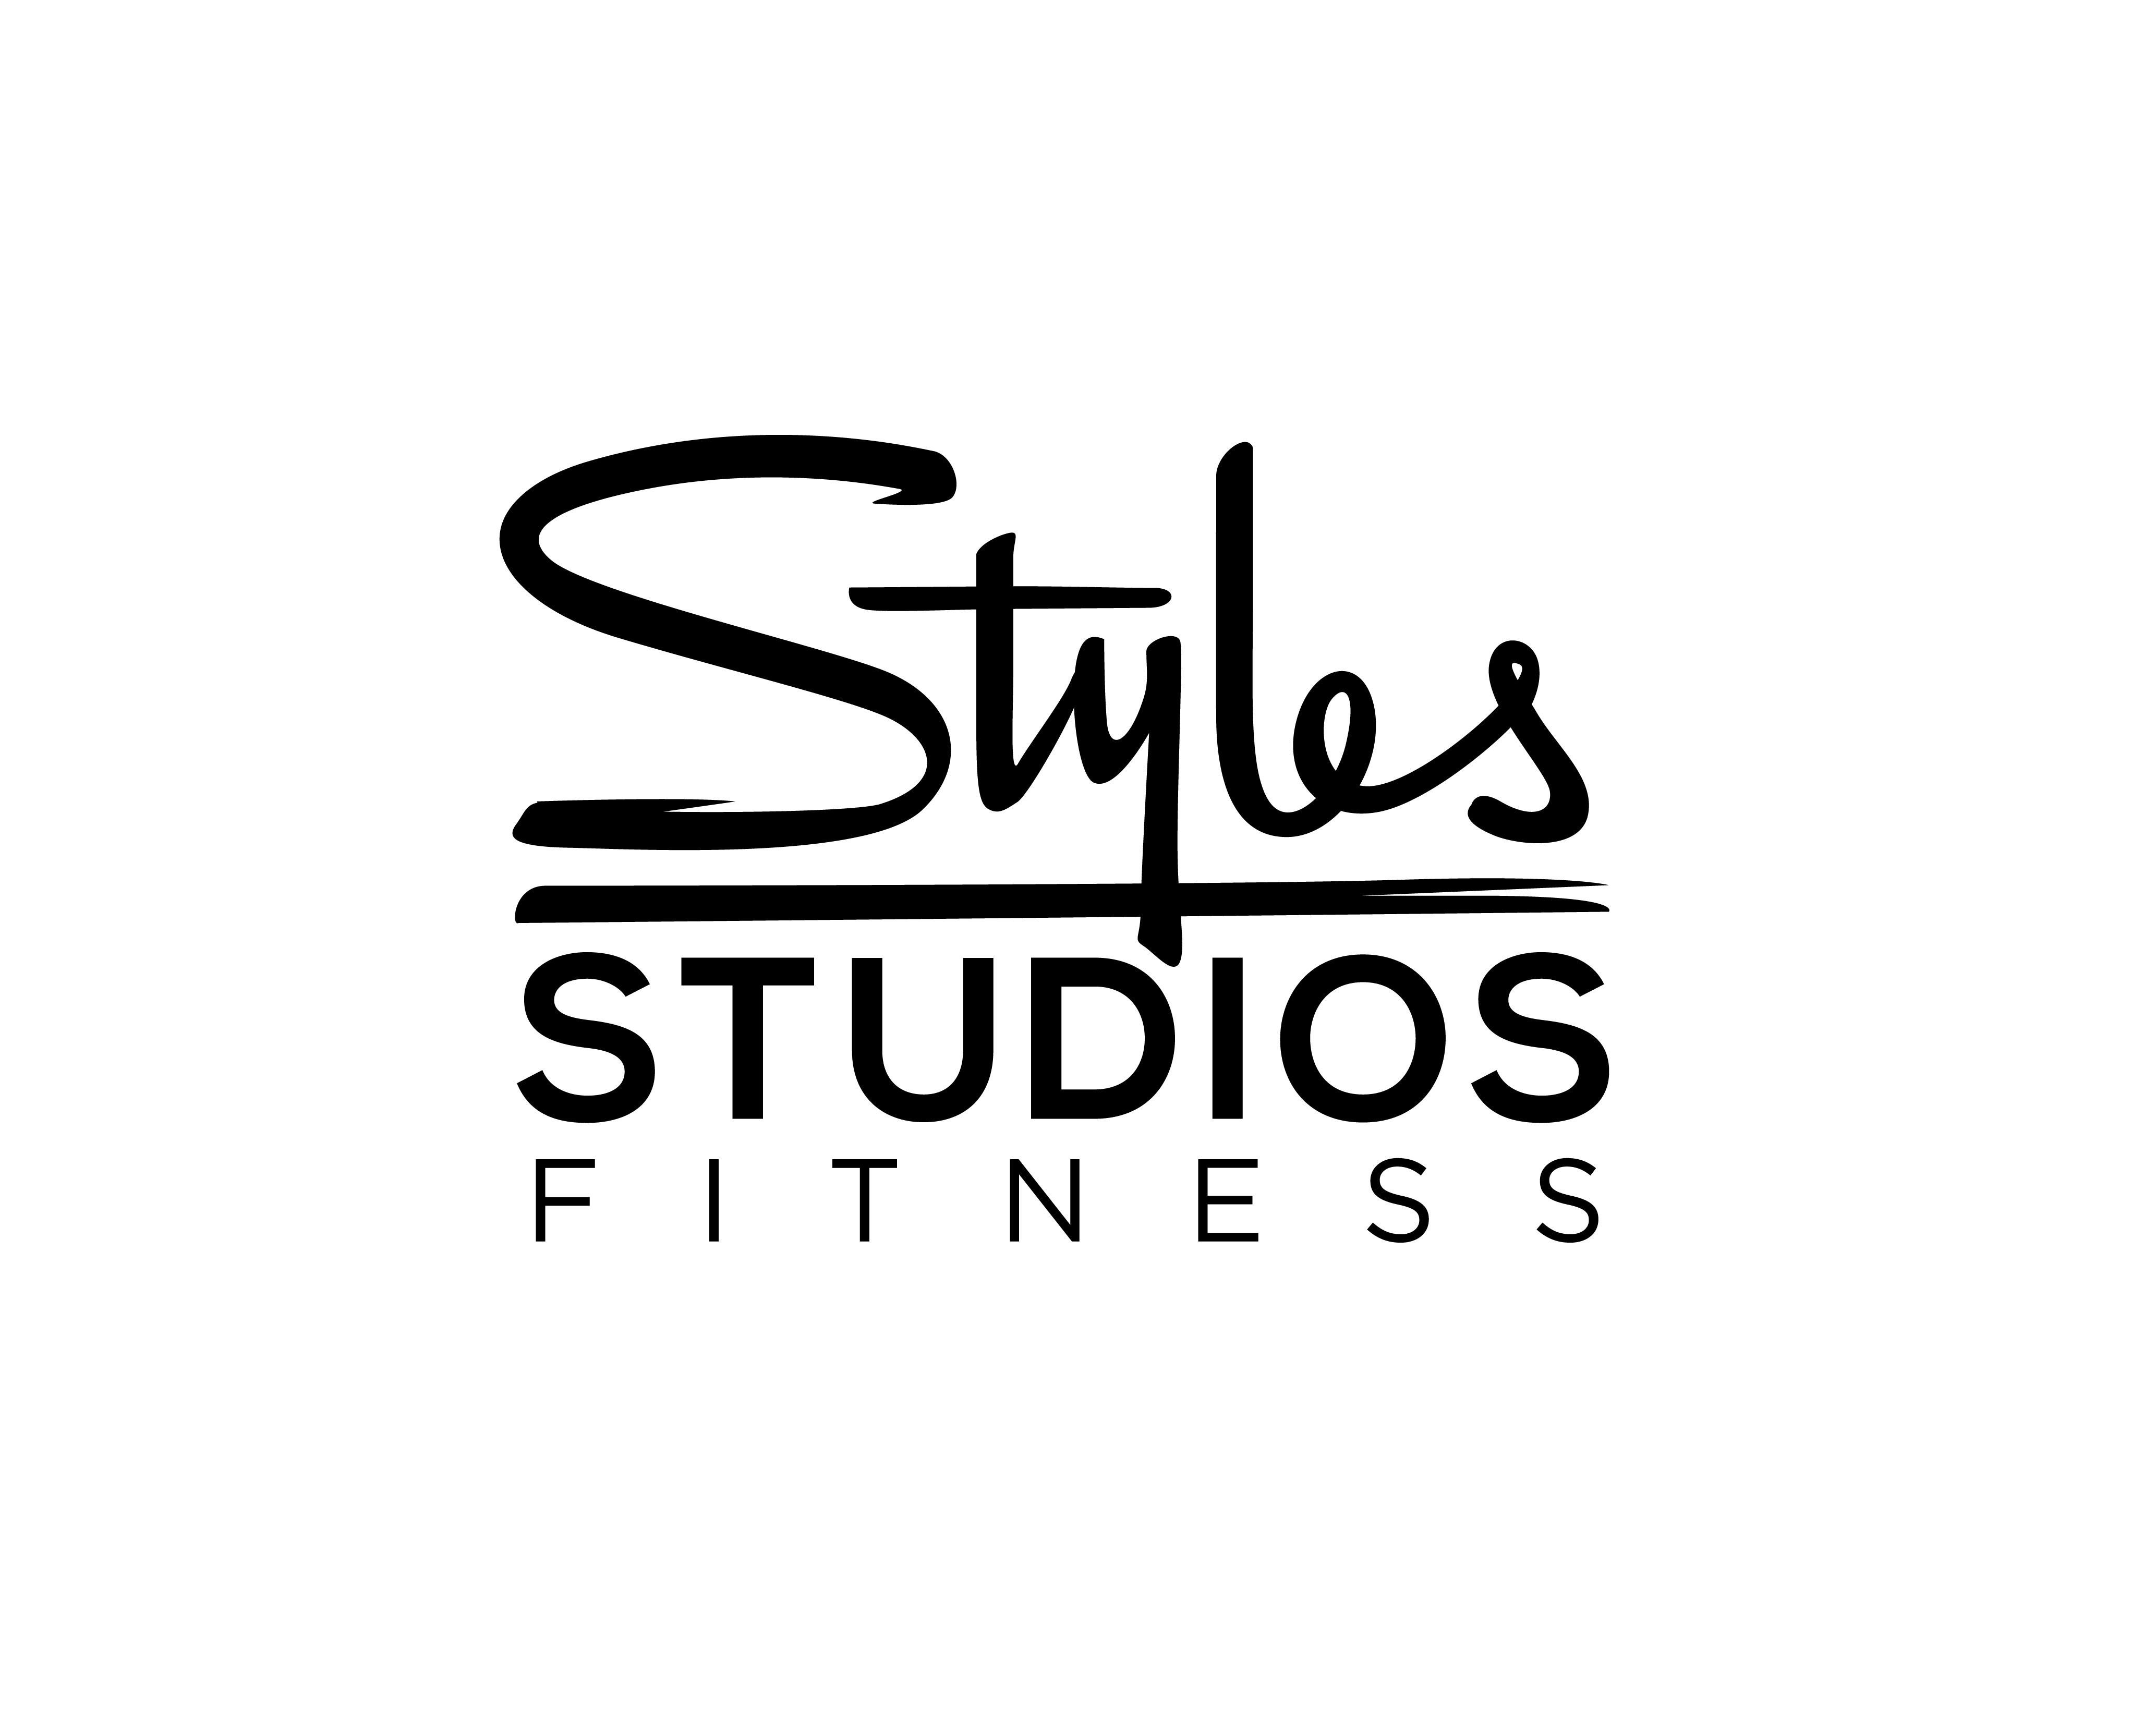 Styles Studios Fitness logo